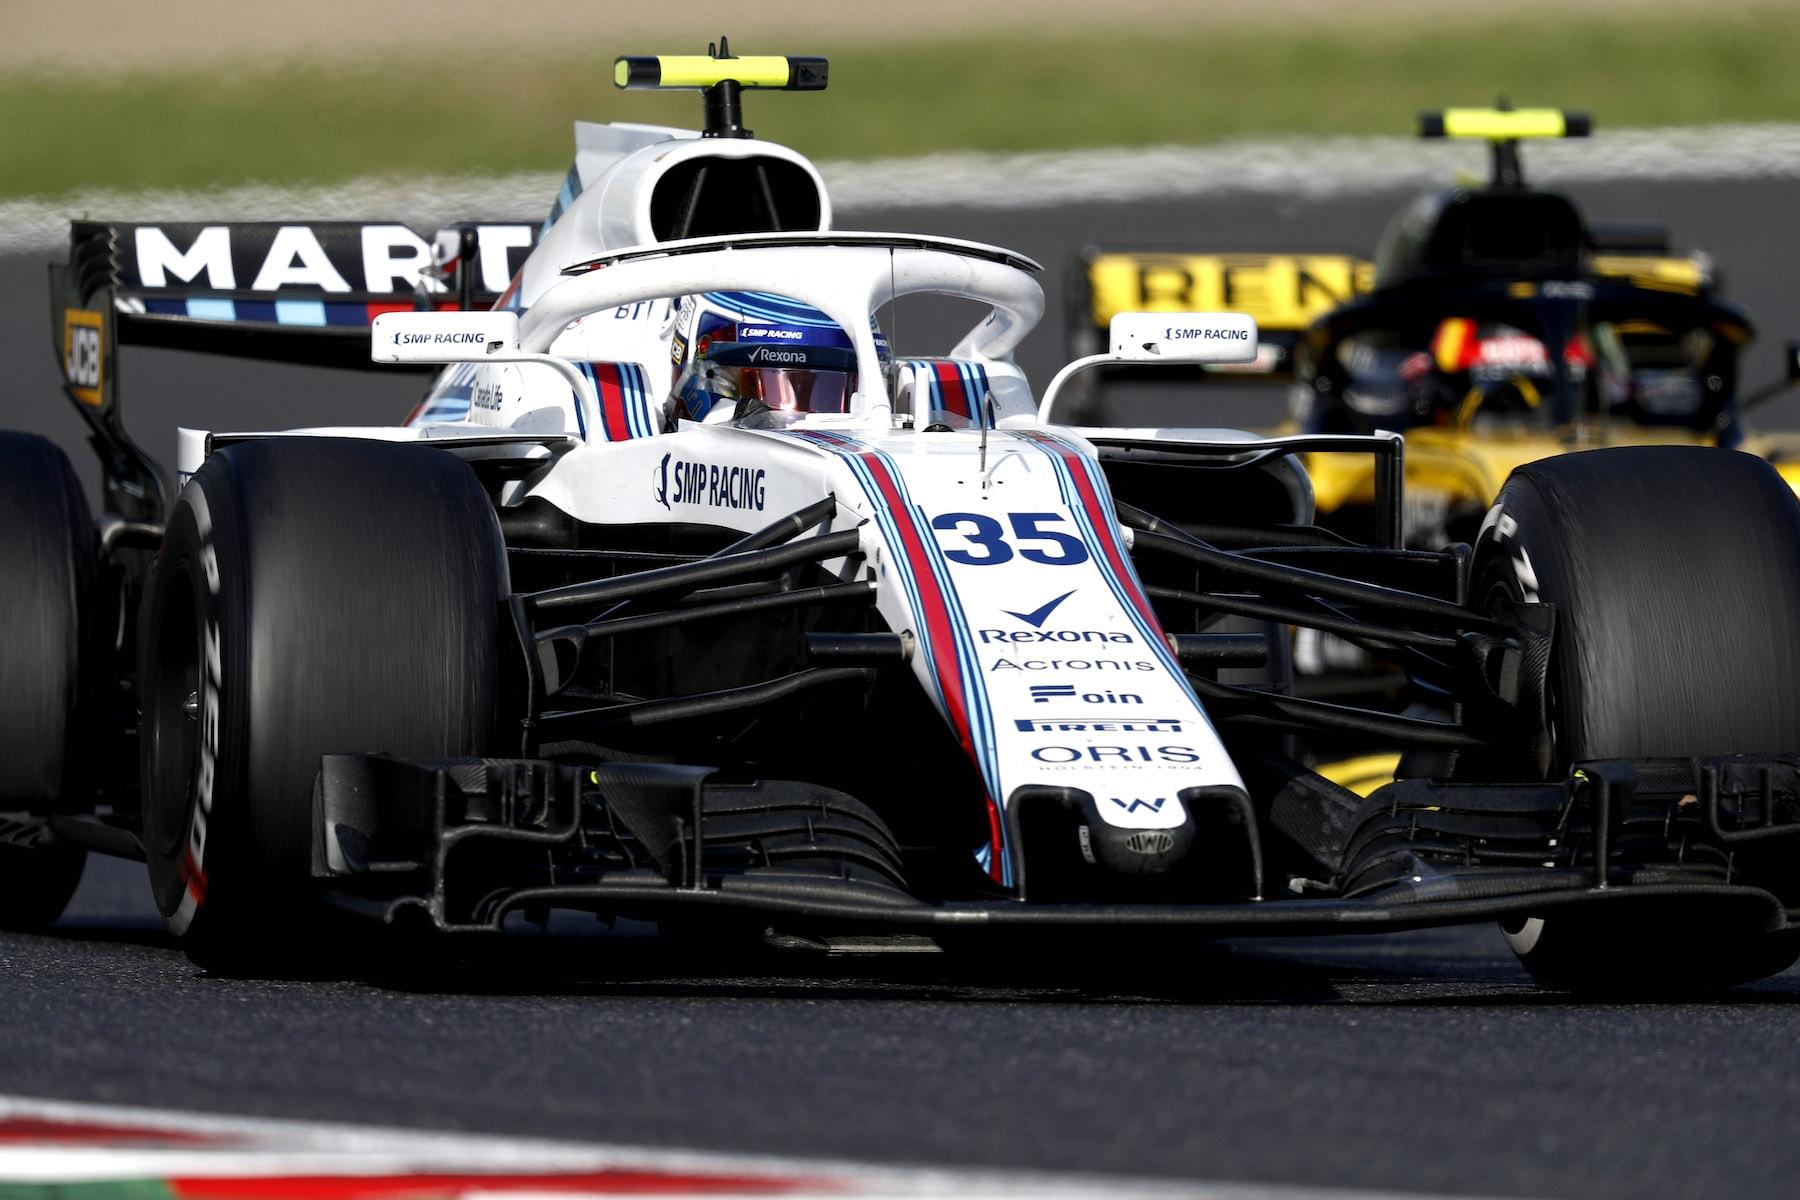 G 2018 Sergey Sirotkin | williams FW41 | 2018 Japanese GP 1 copy.jpg